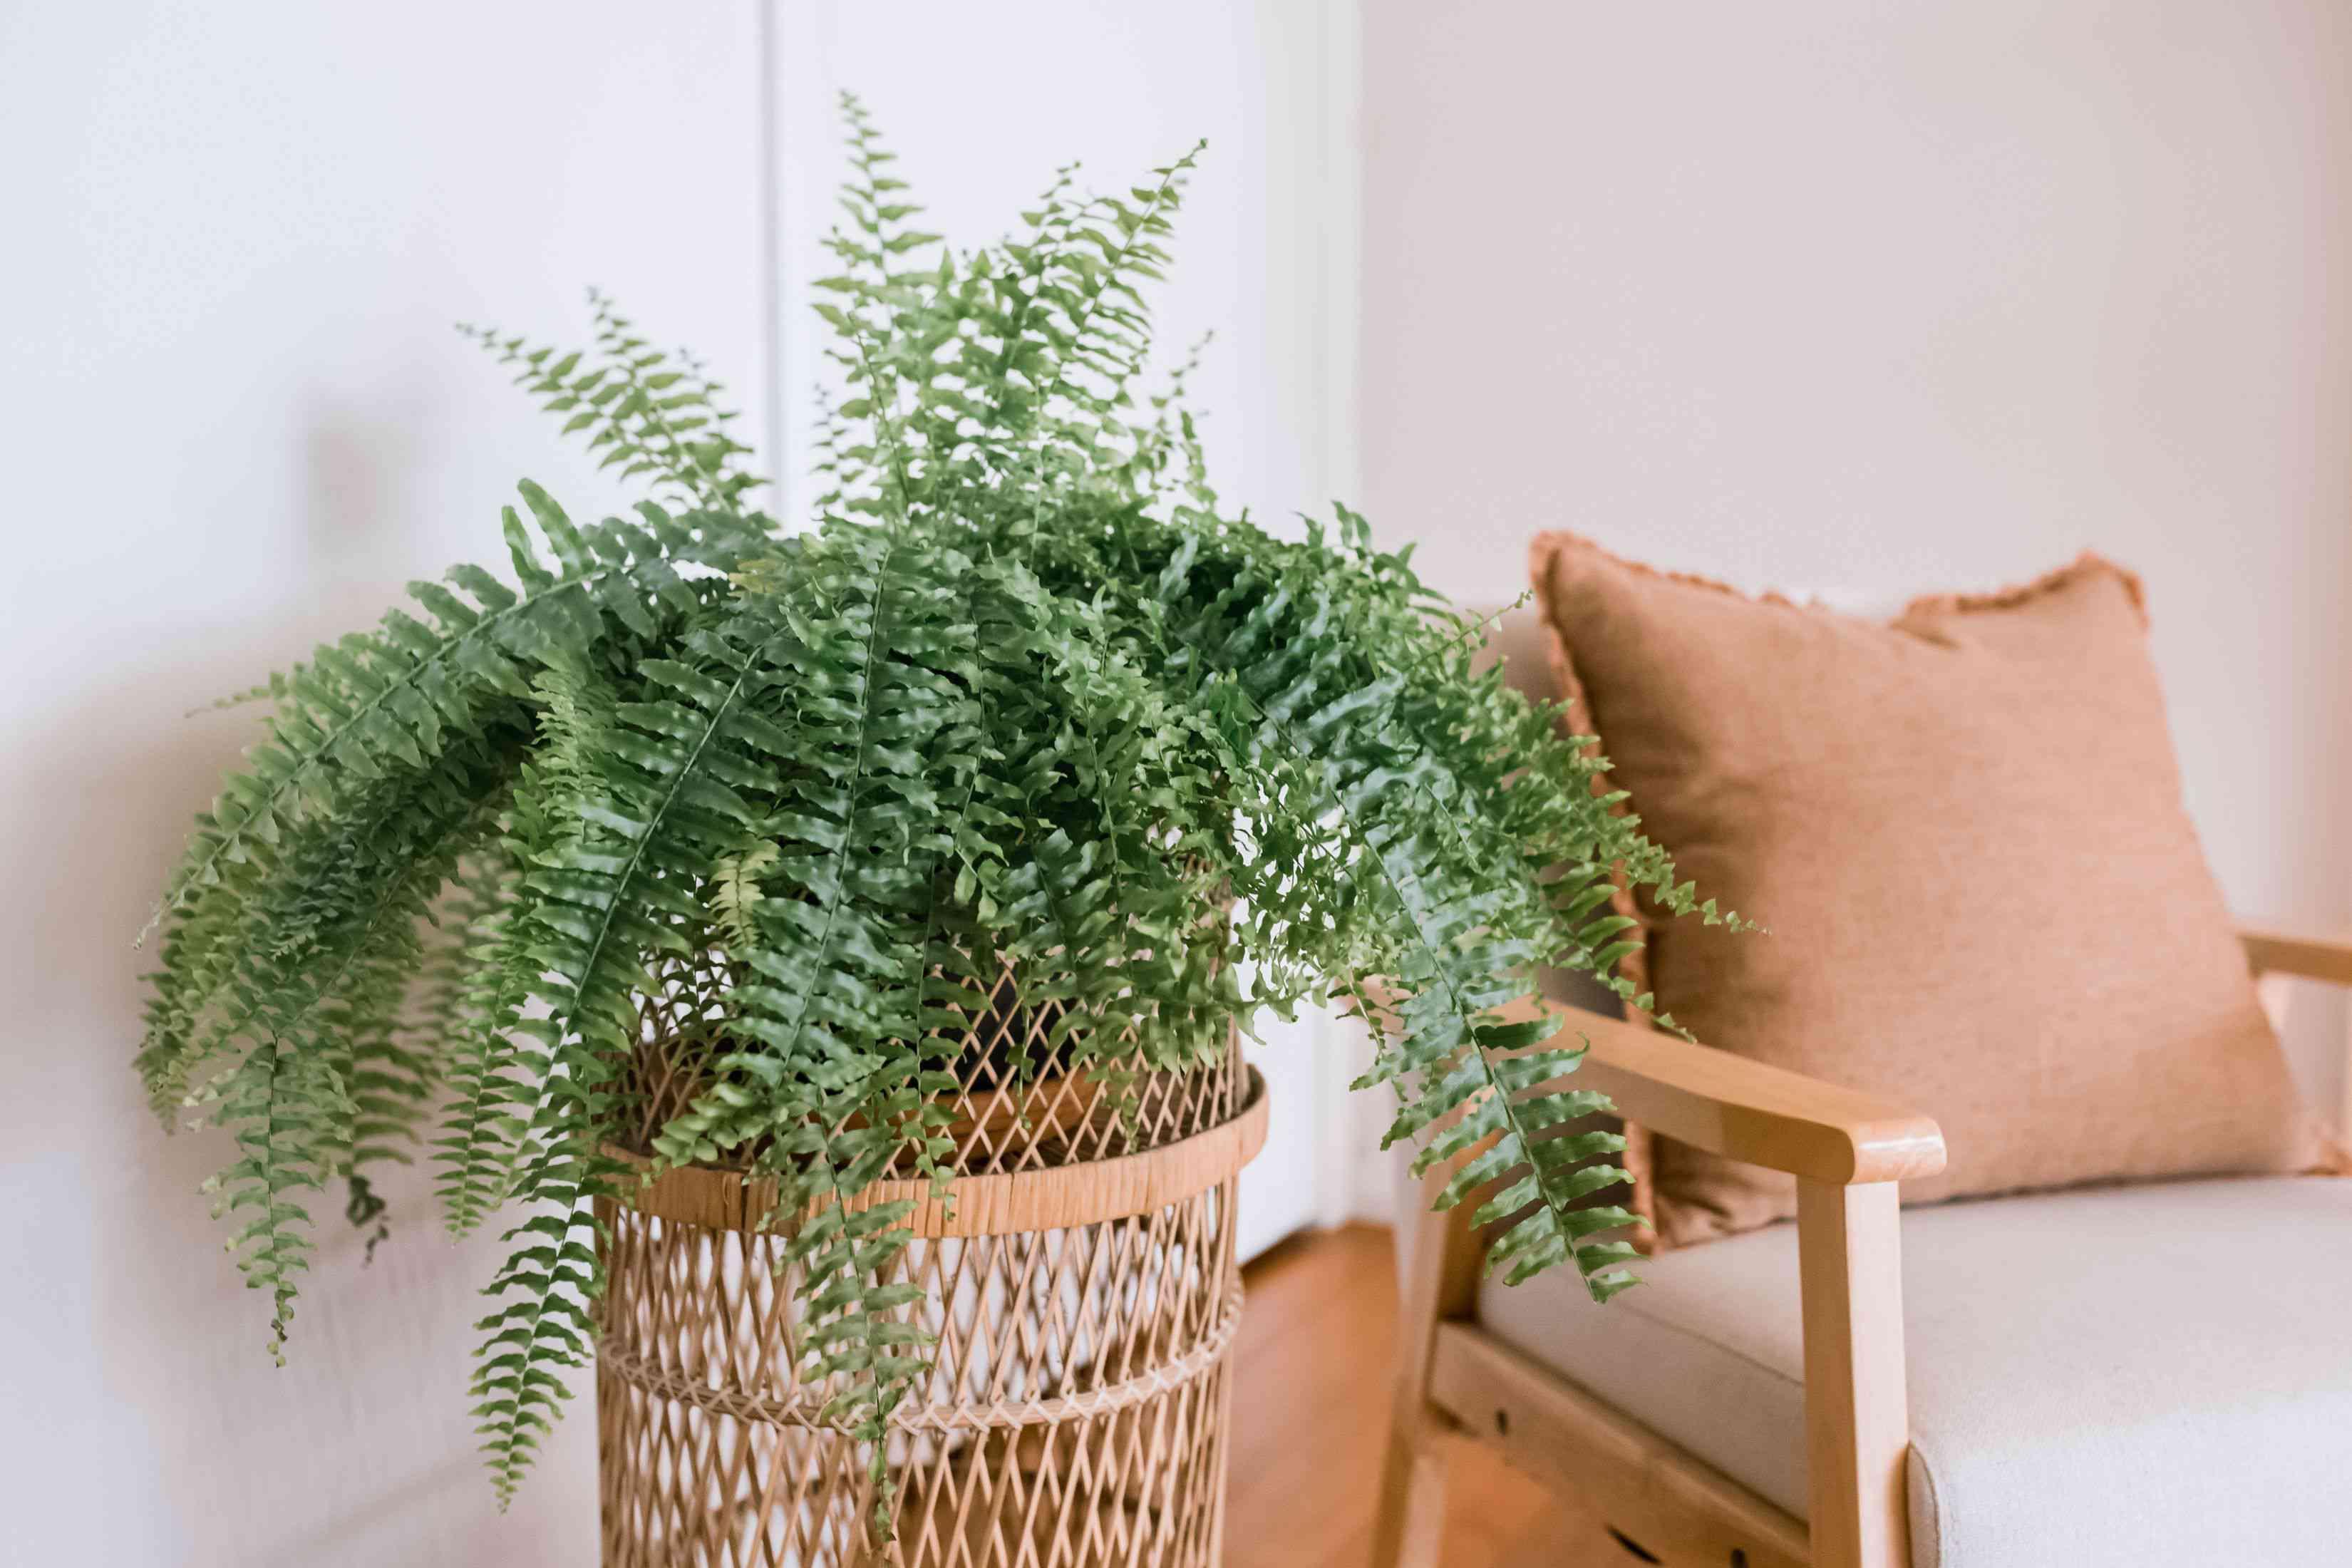 Boston fern plant in wicker holder next to chair